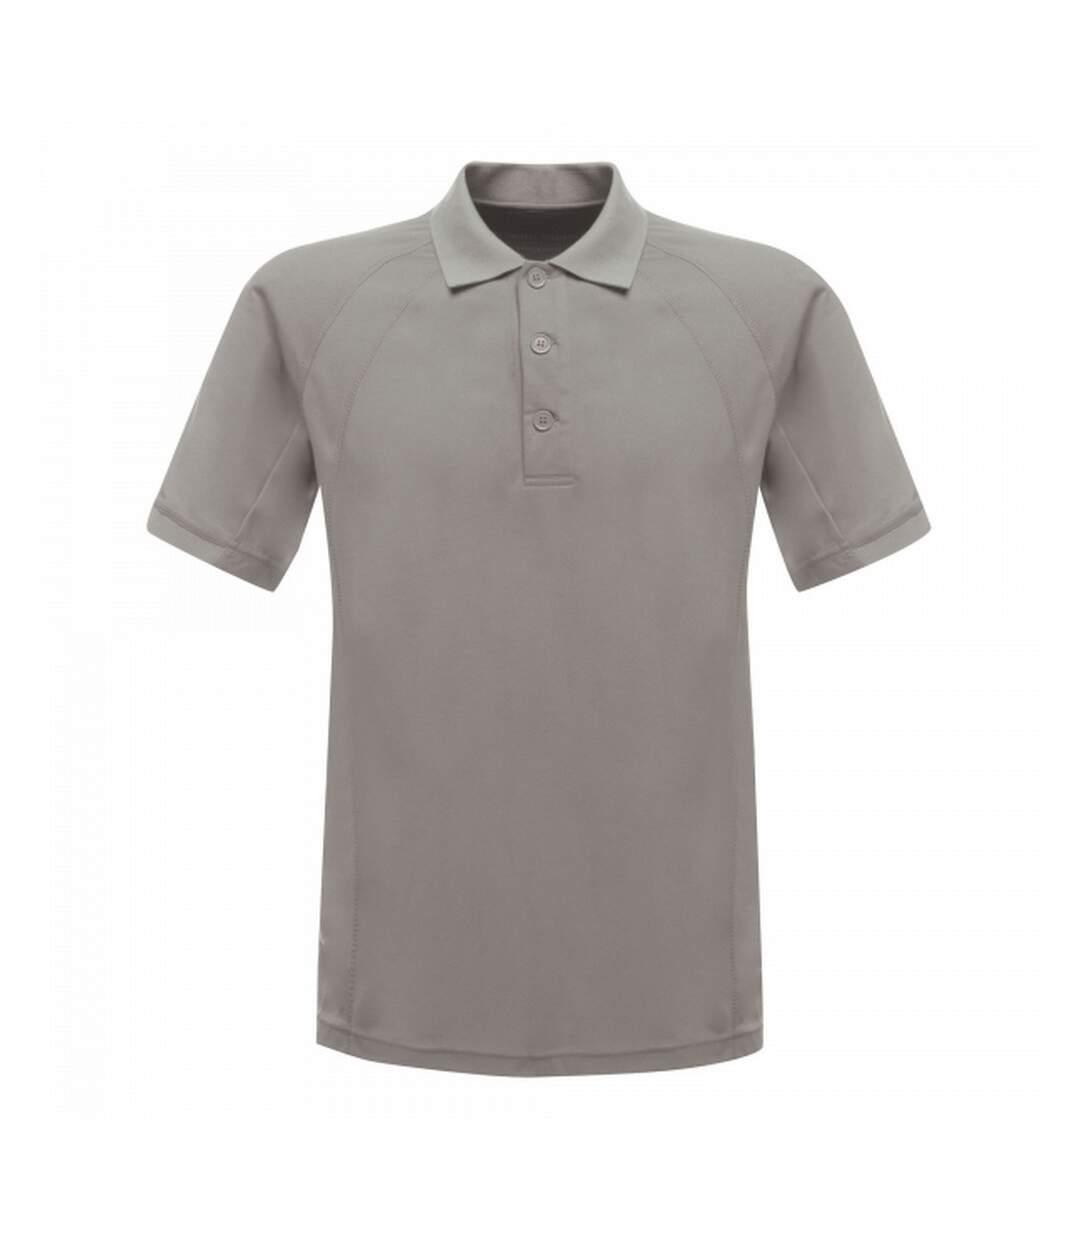 Regatta Professional Mens Coolweave Short Sleeve Polo Shirt (Silver Grey) - UTRG2161